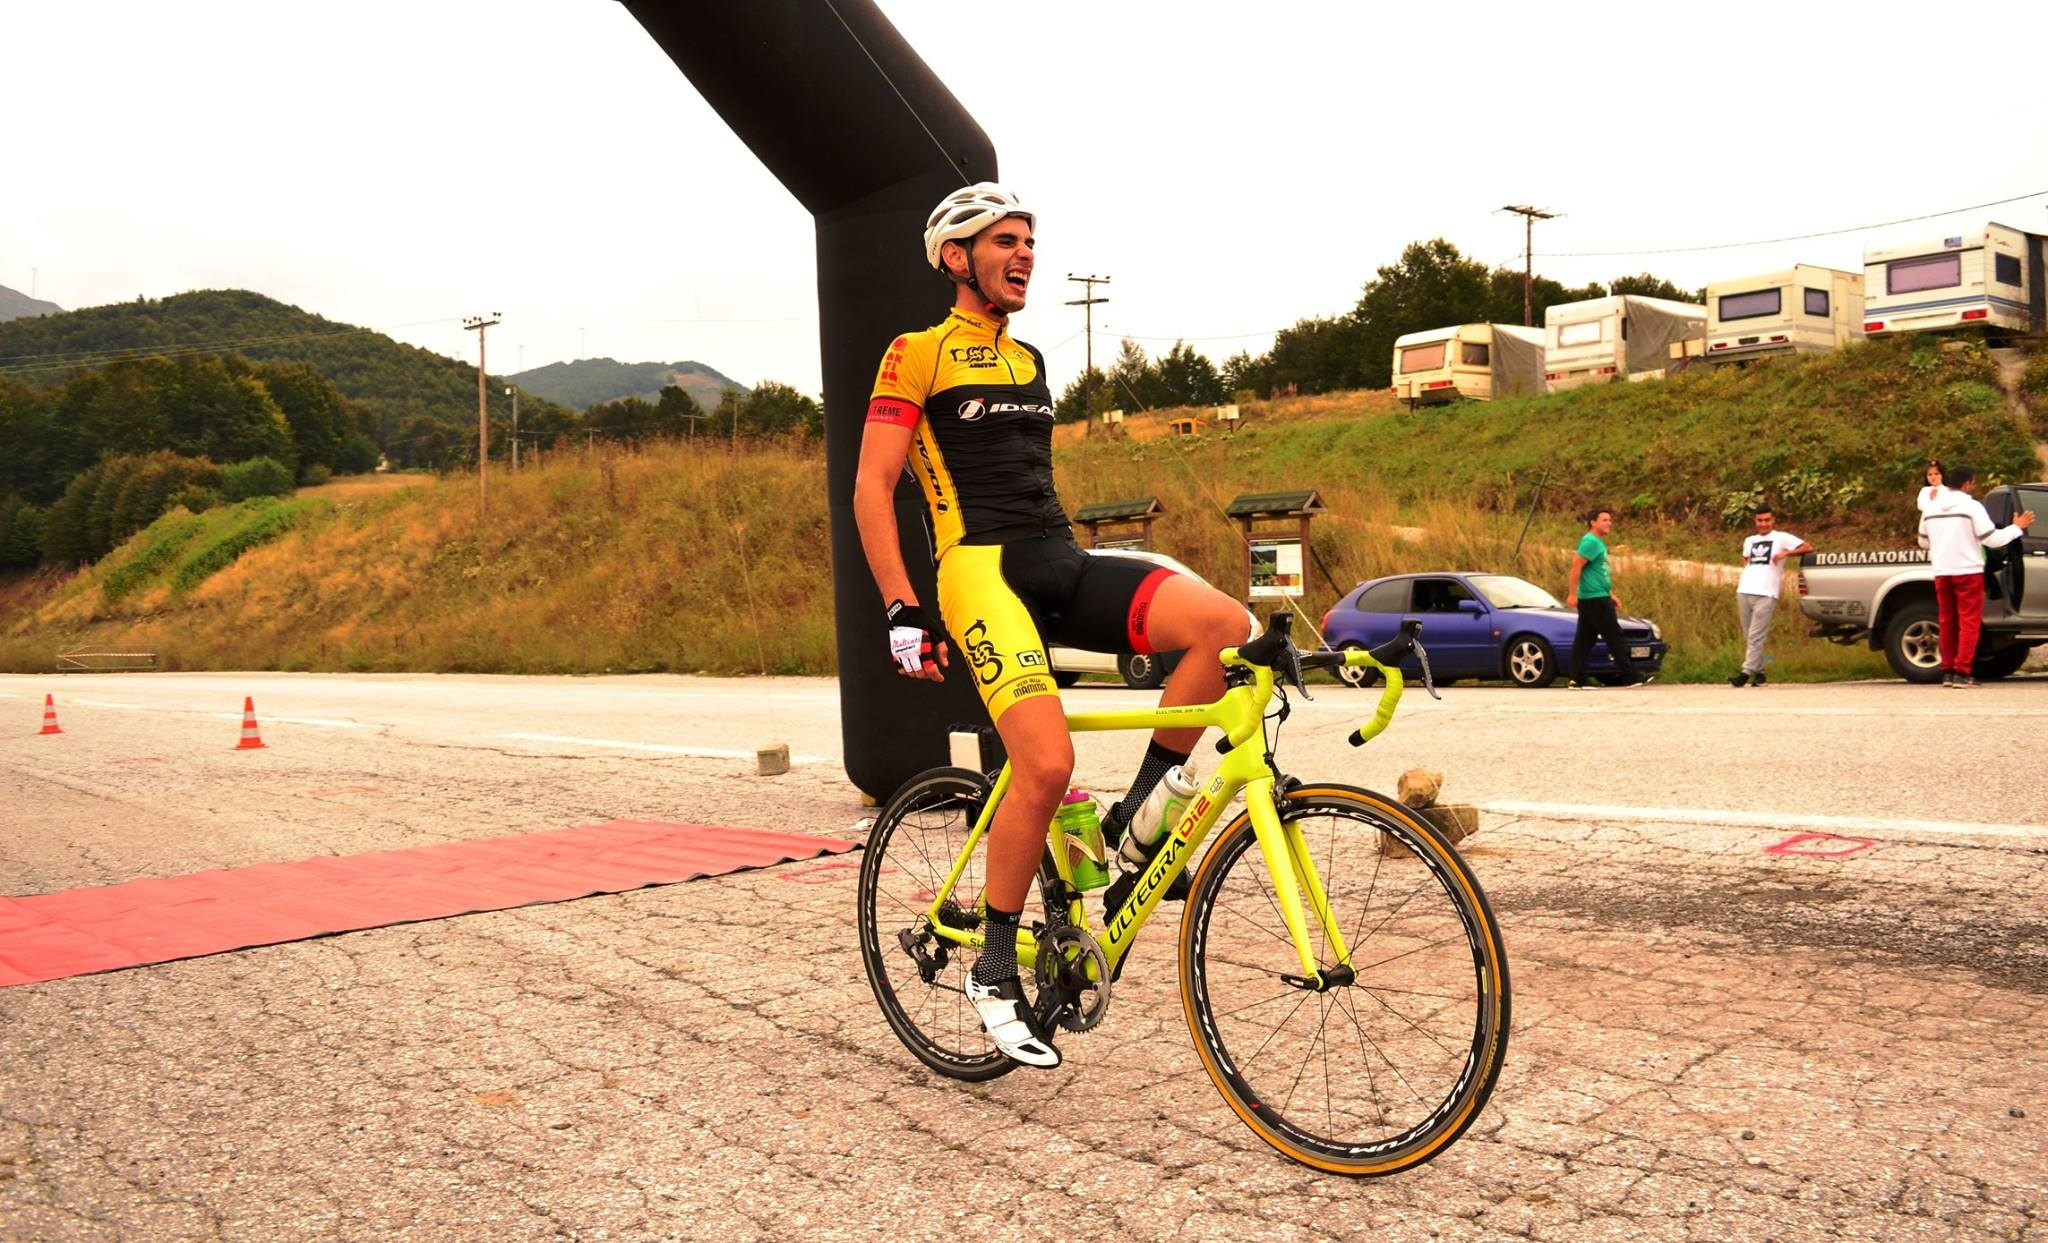 giorgos prassos 1 - Πτολεμαΐδα: Αυτοκίνητο παρέσυρε έξι ποδηλάτες - Δύο νεκροί, ένας χαροπαλεύει!